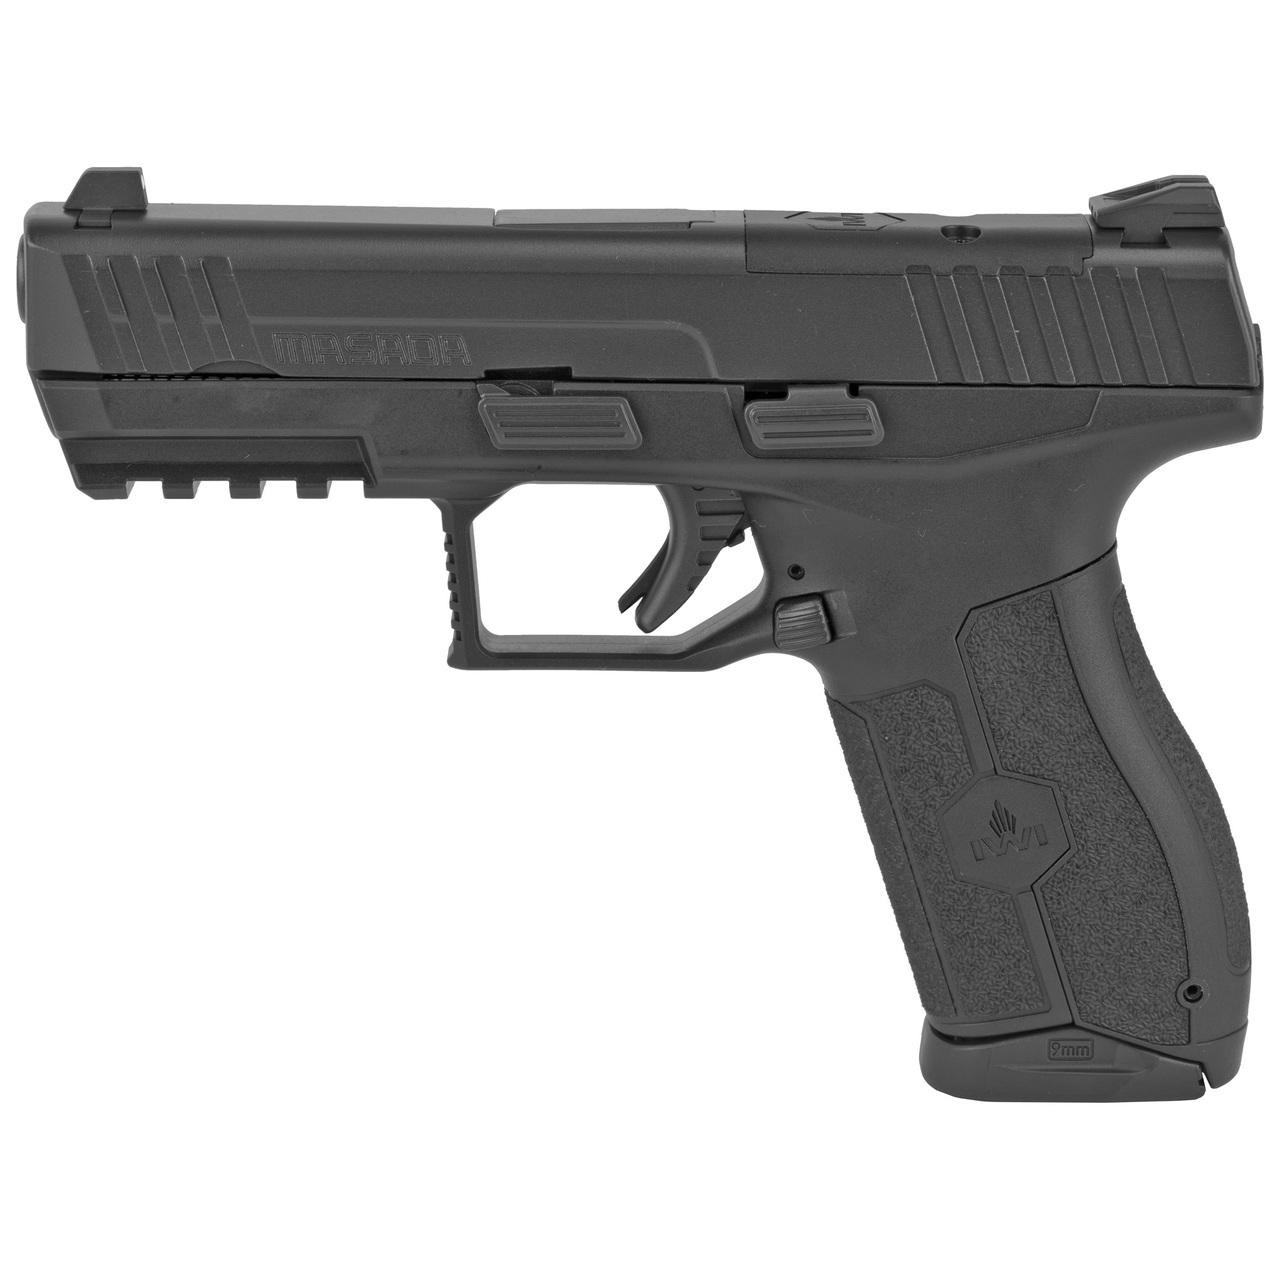 Iwi Masada M9orp17 9mm 4 Black Optic Ready 17 1 409 Gun Deals